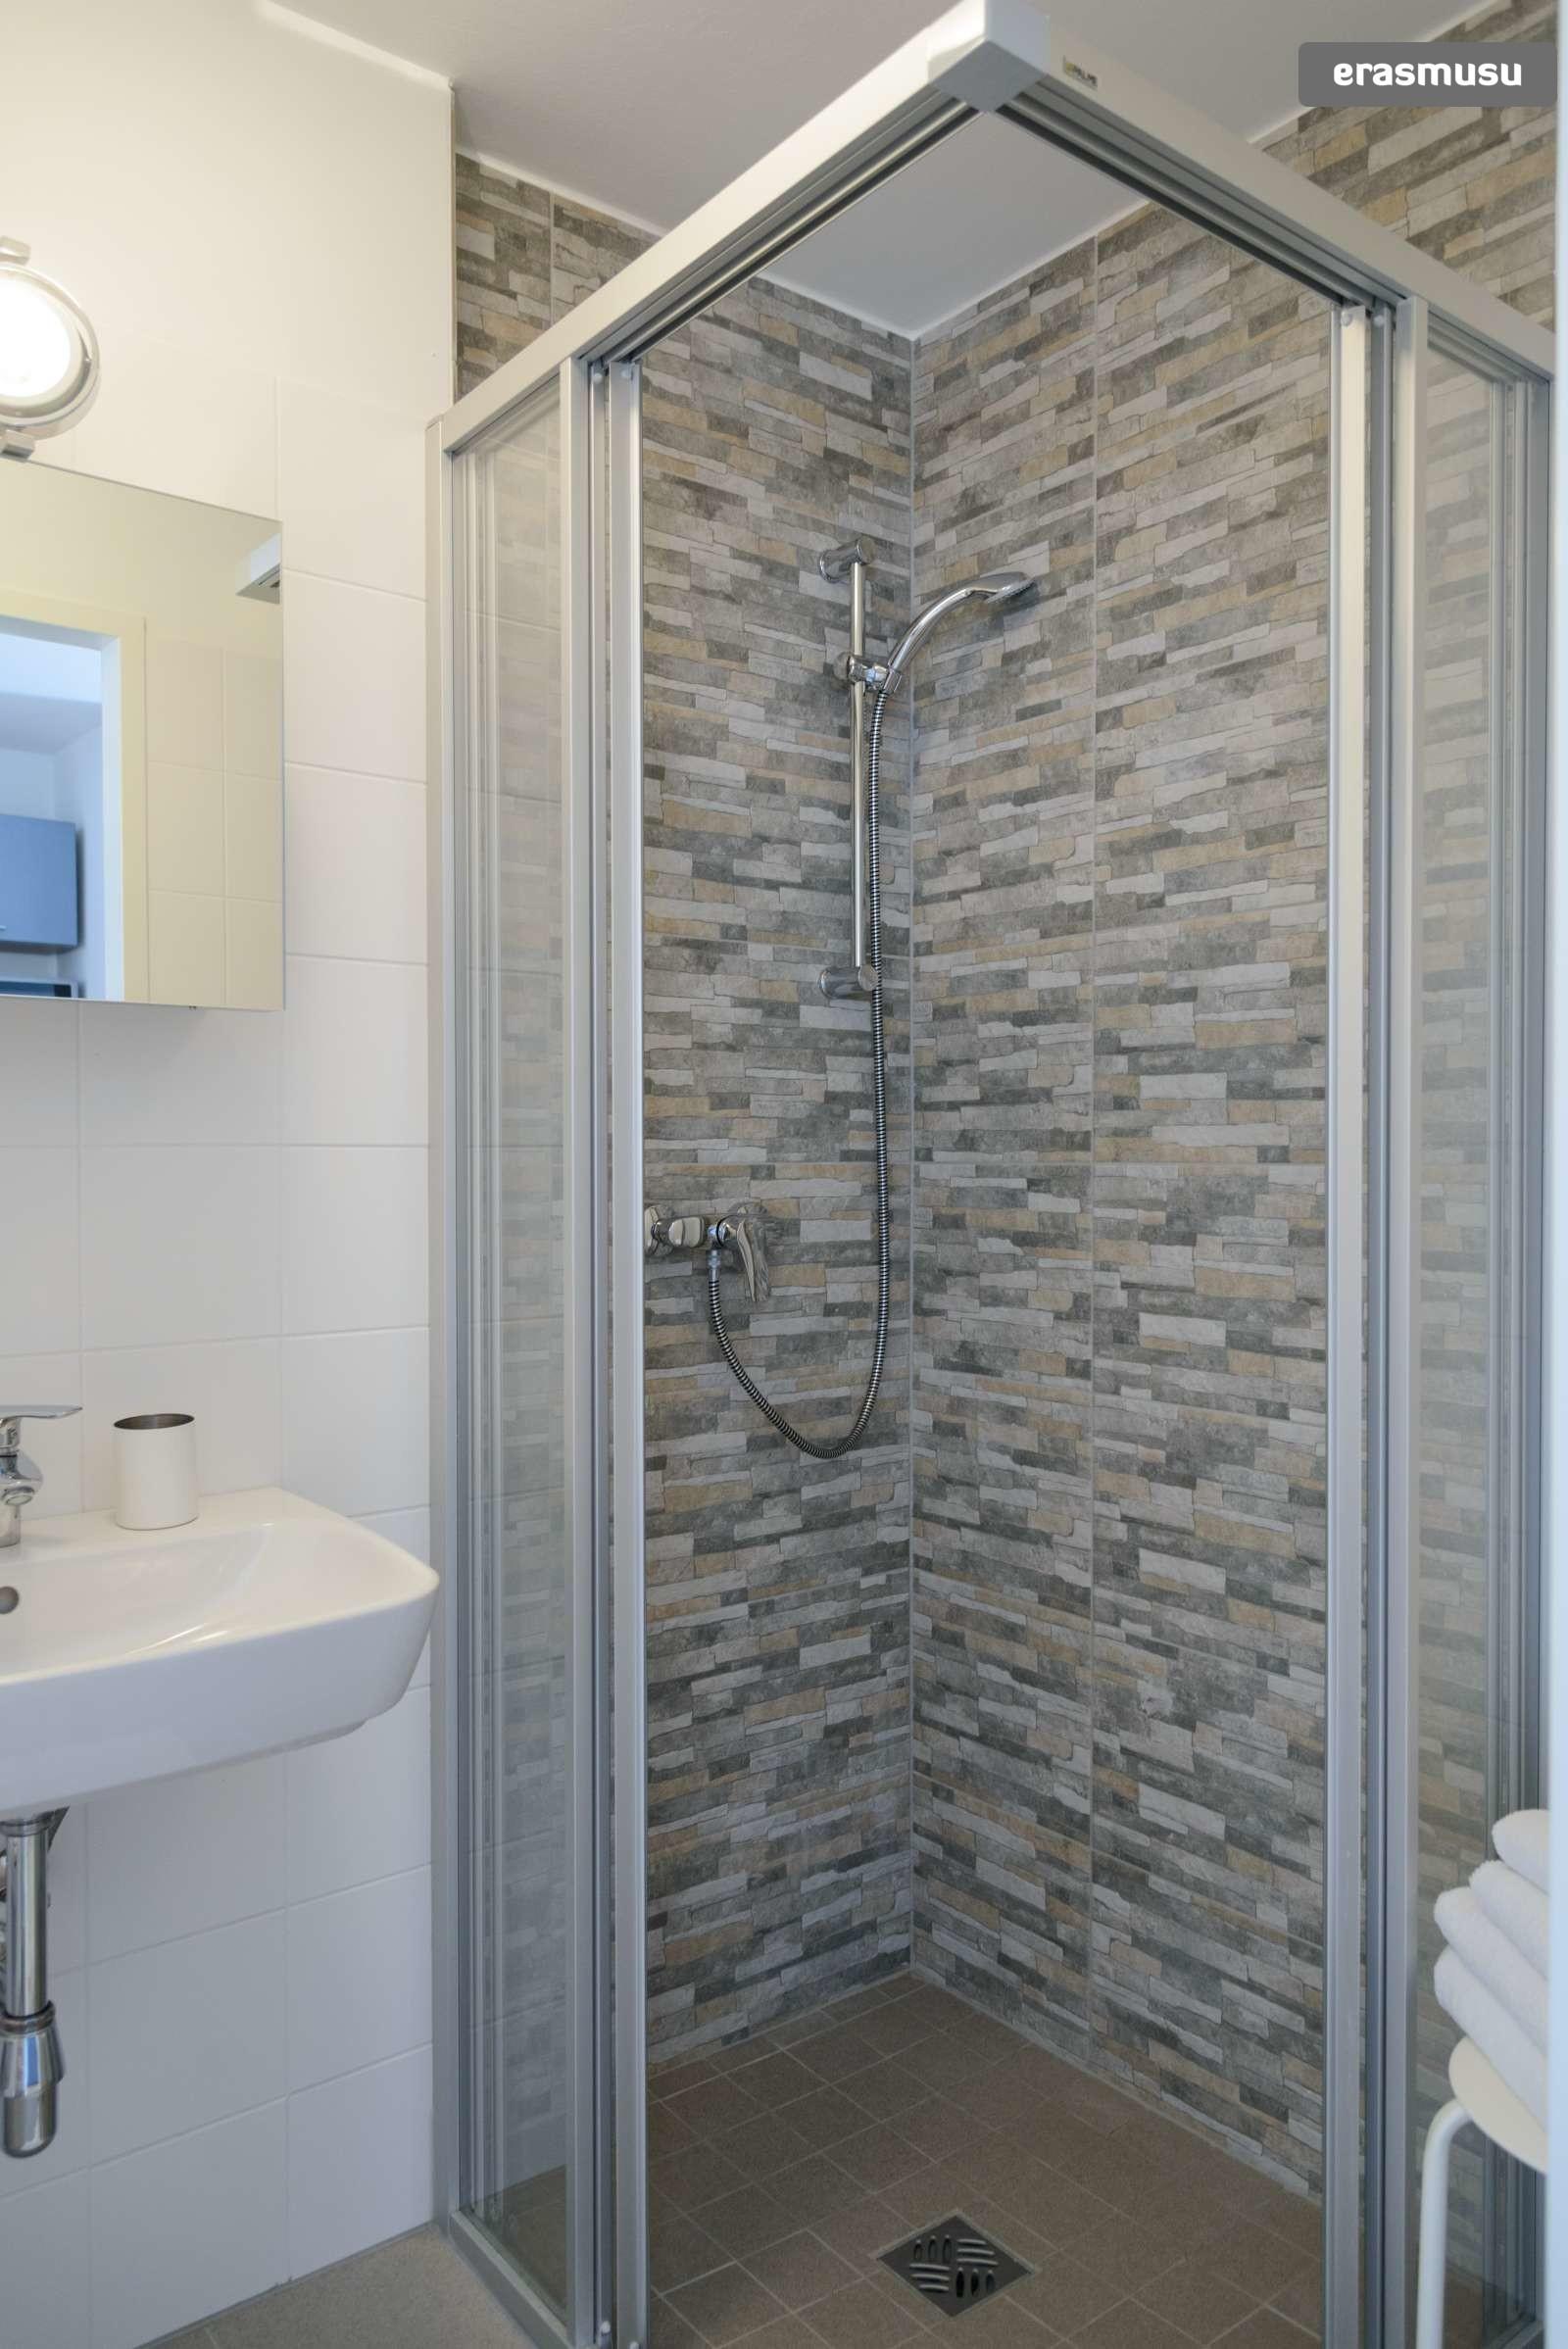 spacious-studio-apartment-rent-aspern-area-donaustadt-c249e165aa